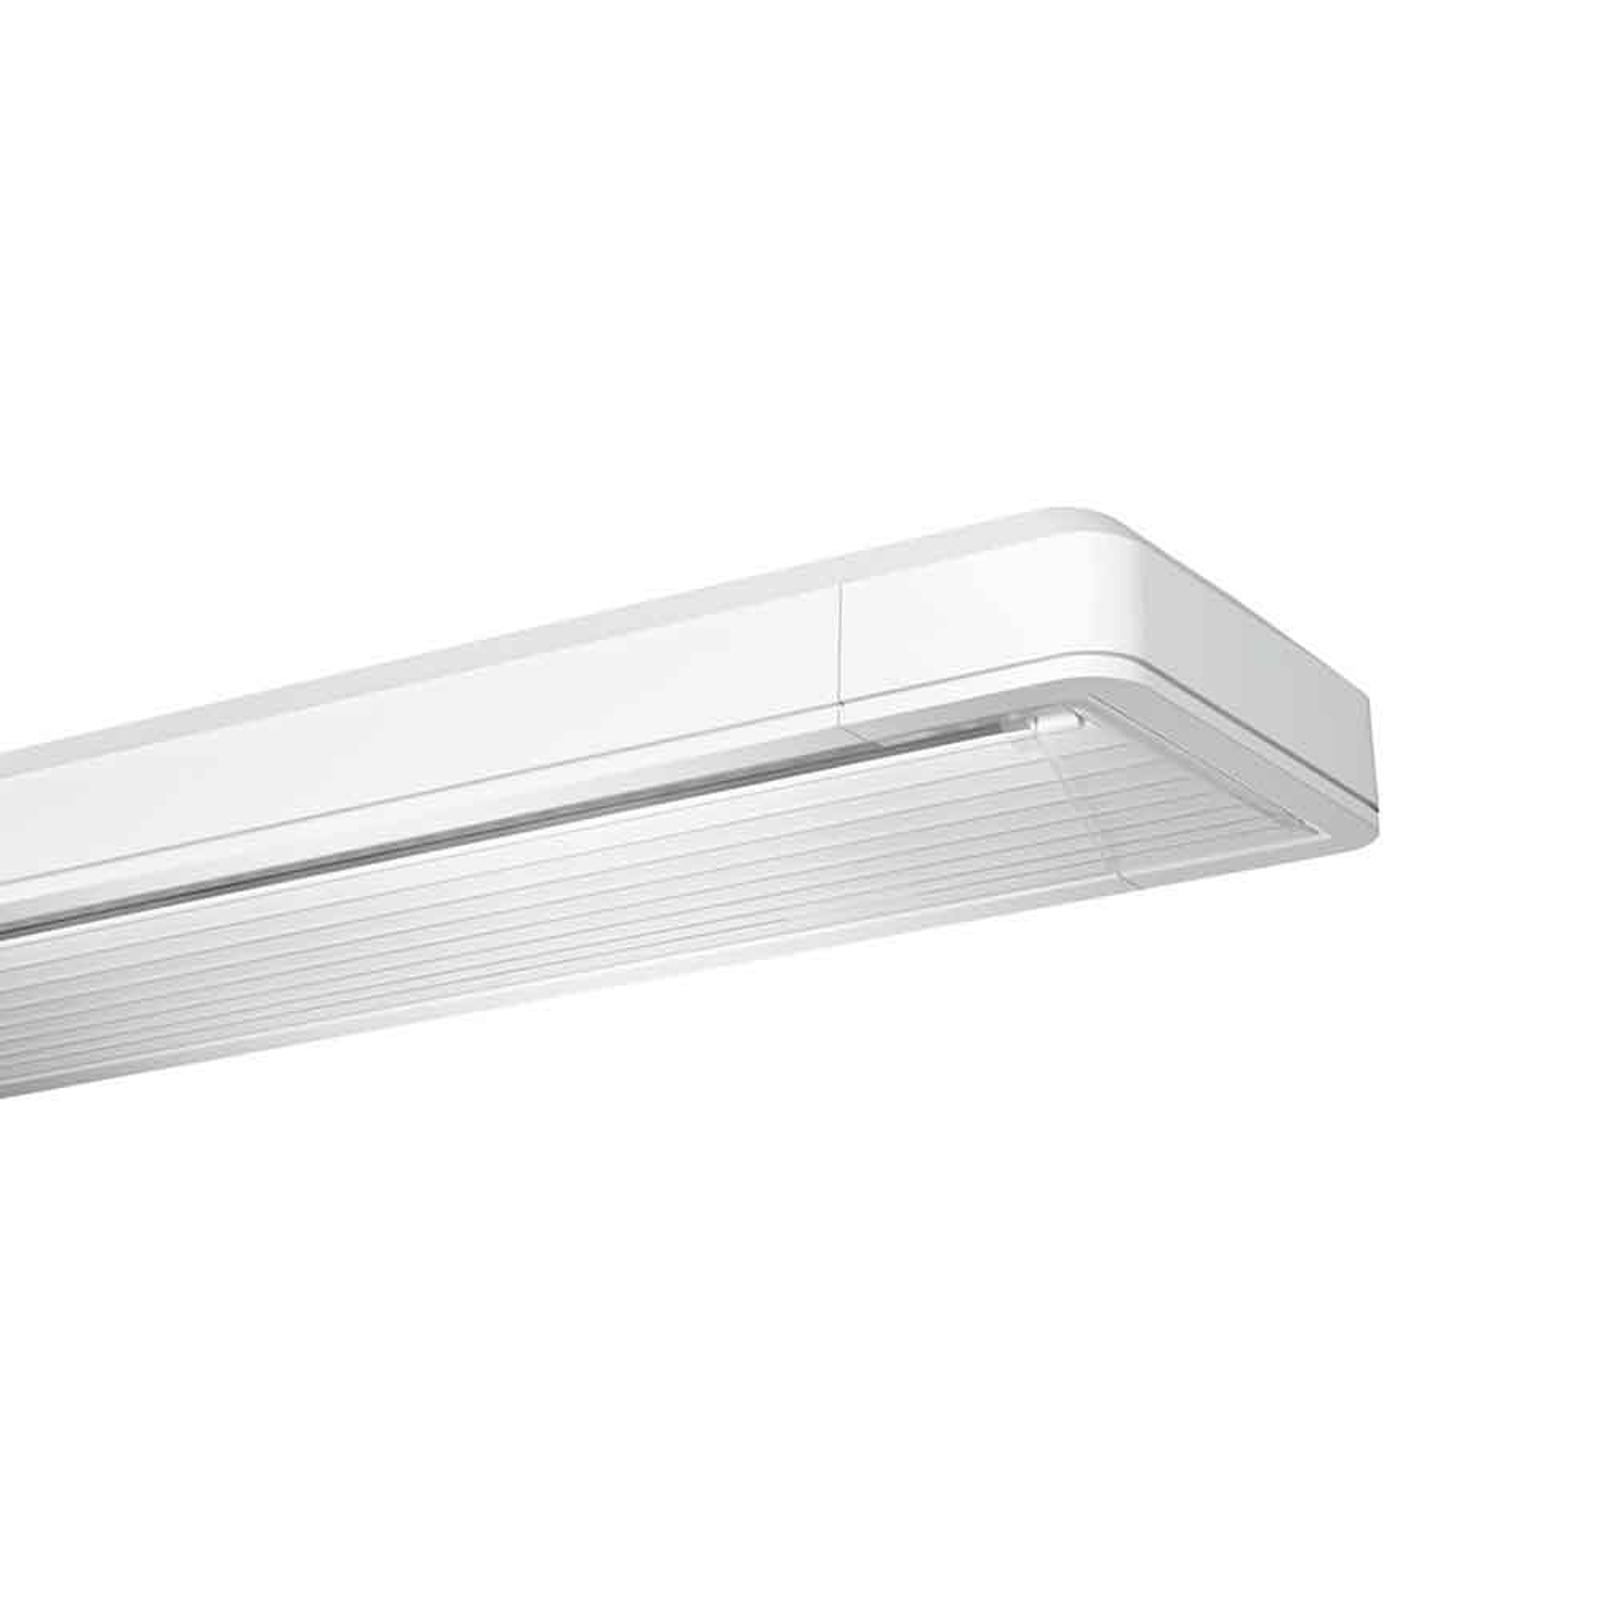 Siteco Taris lampa sufitowa LED 151cm EVG-DALI